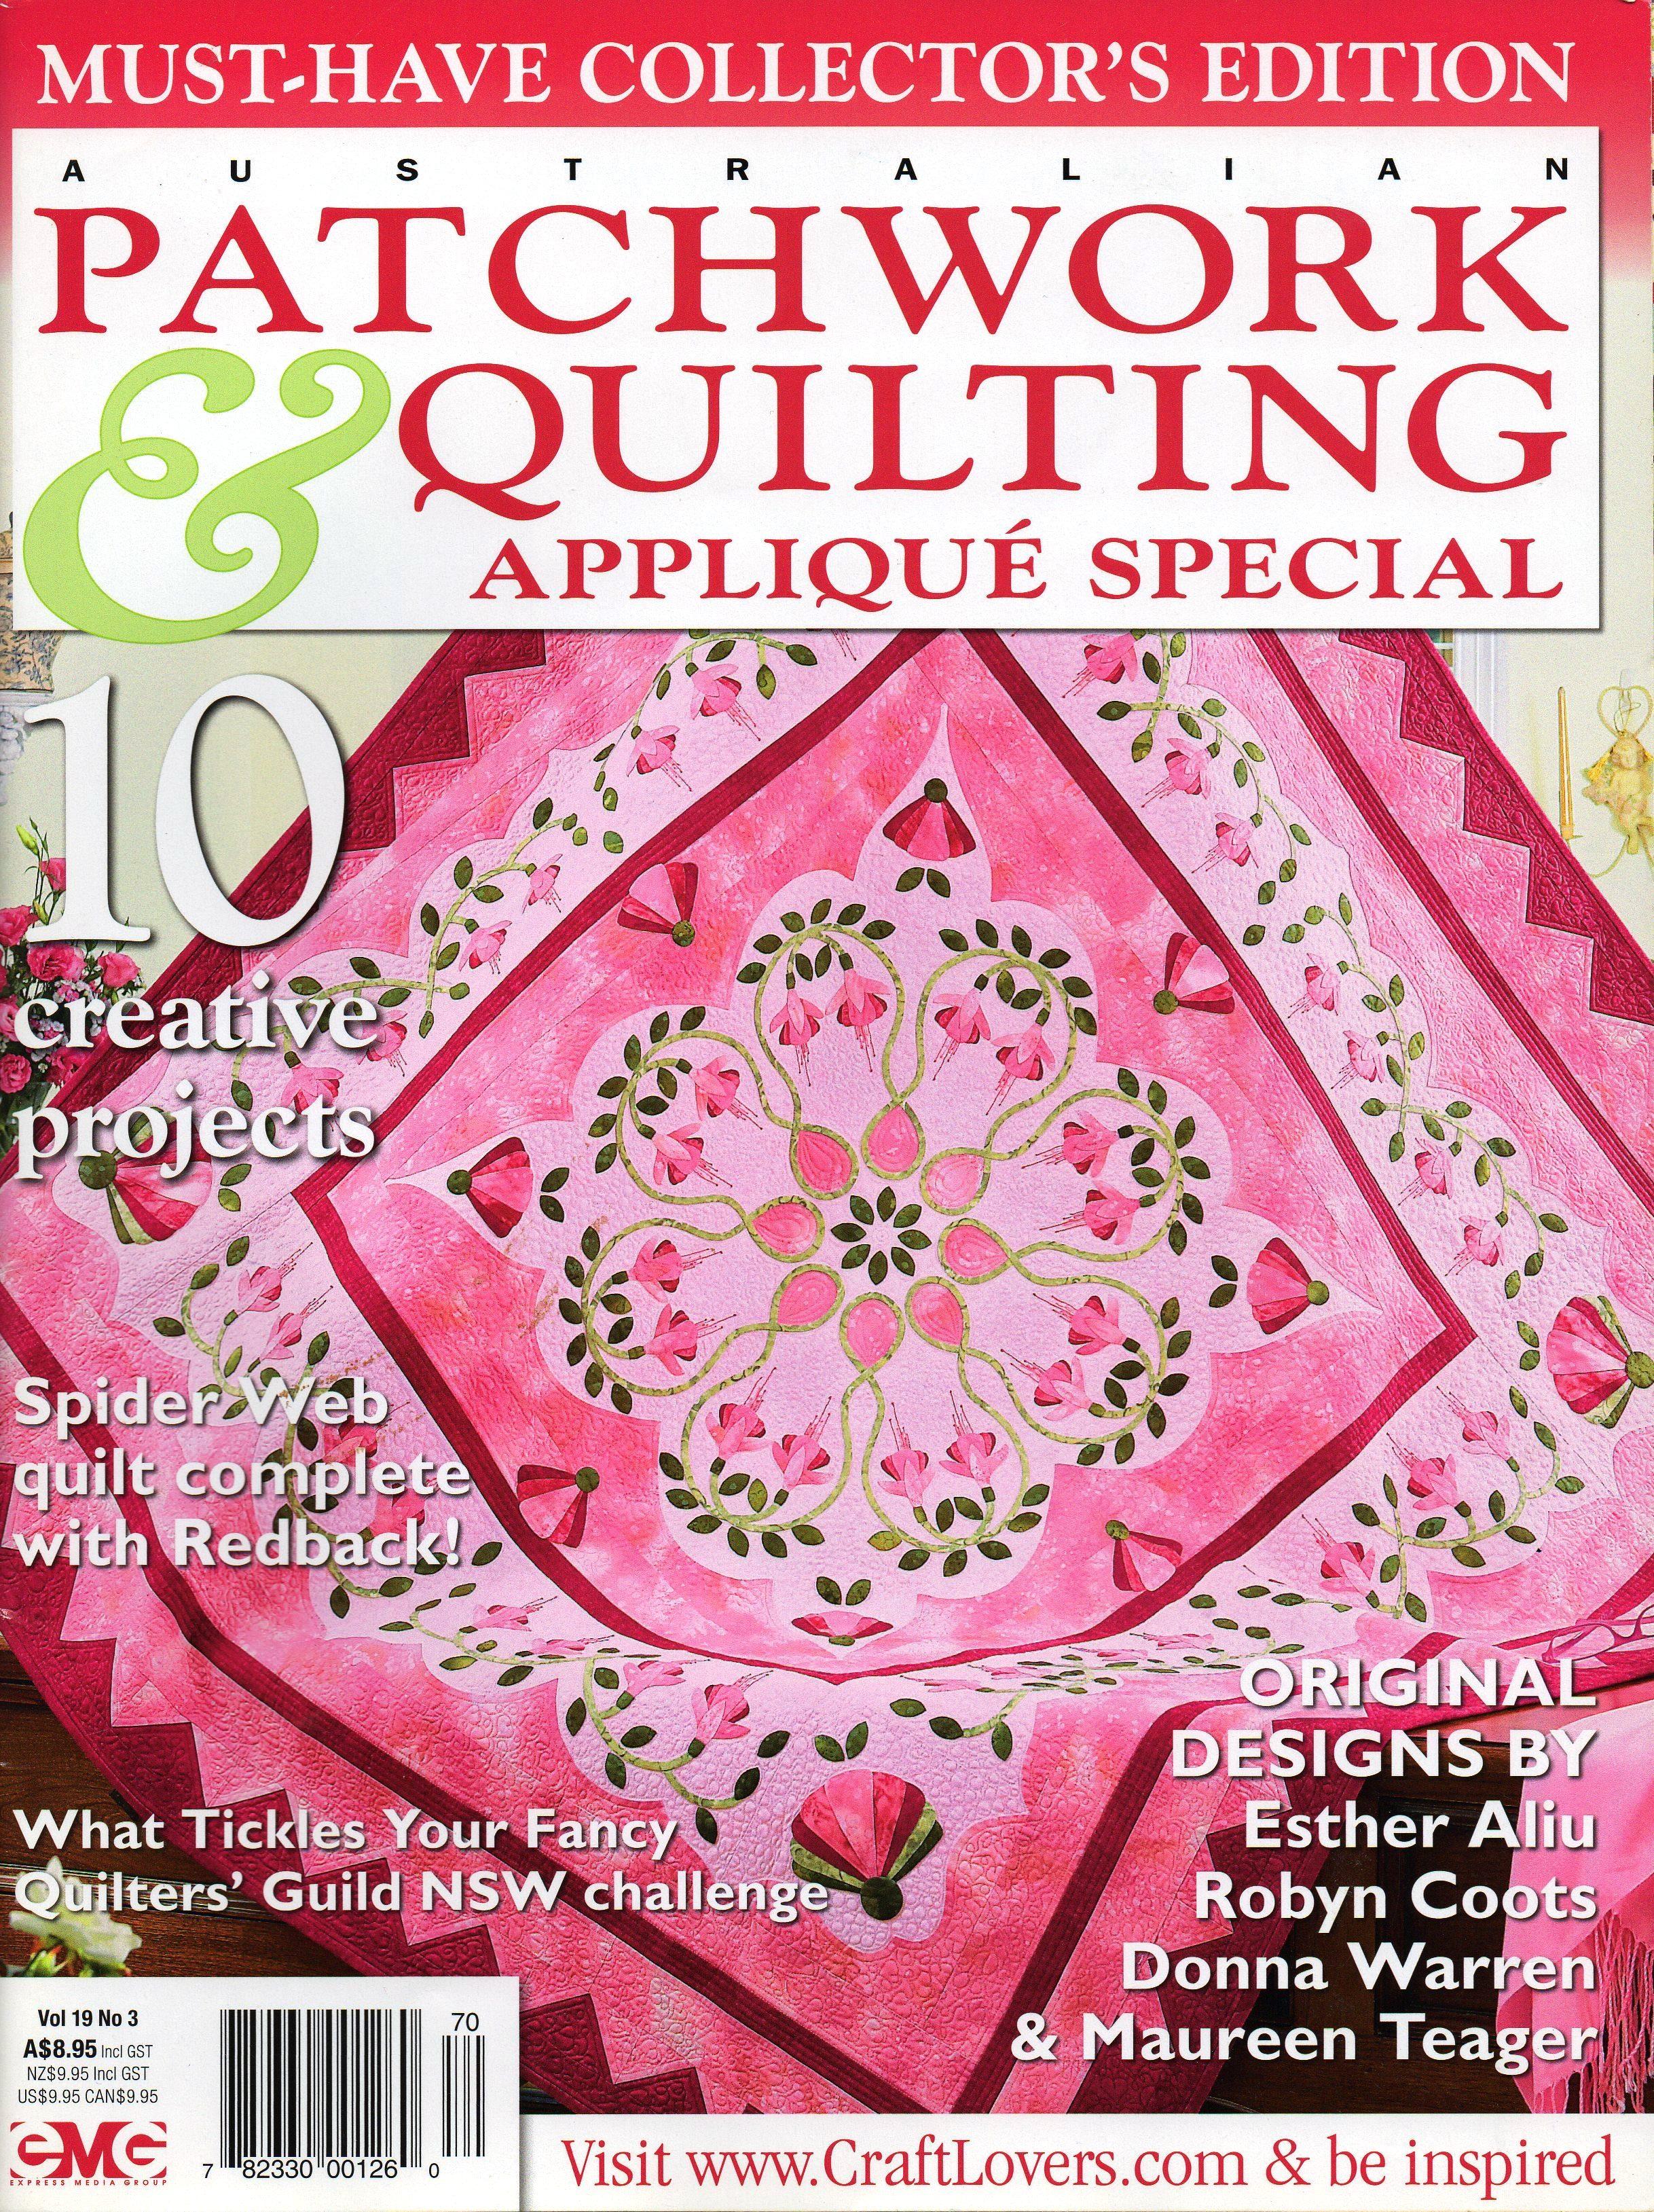 Aust. Patchwork & Quilting 2010 #3